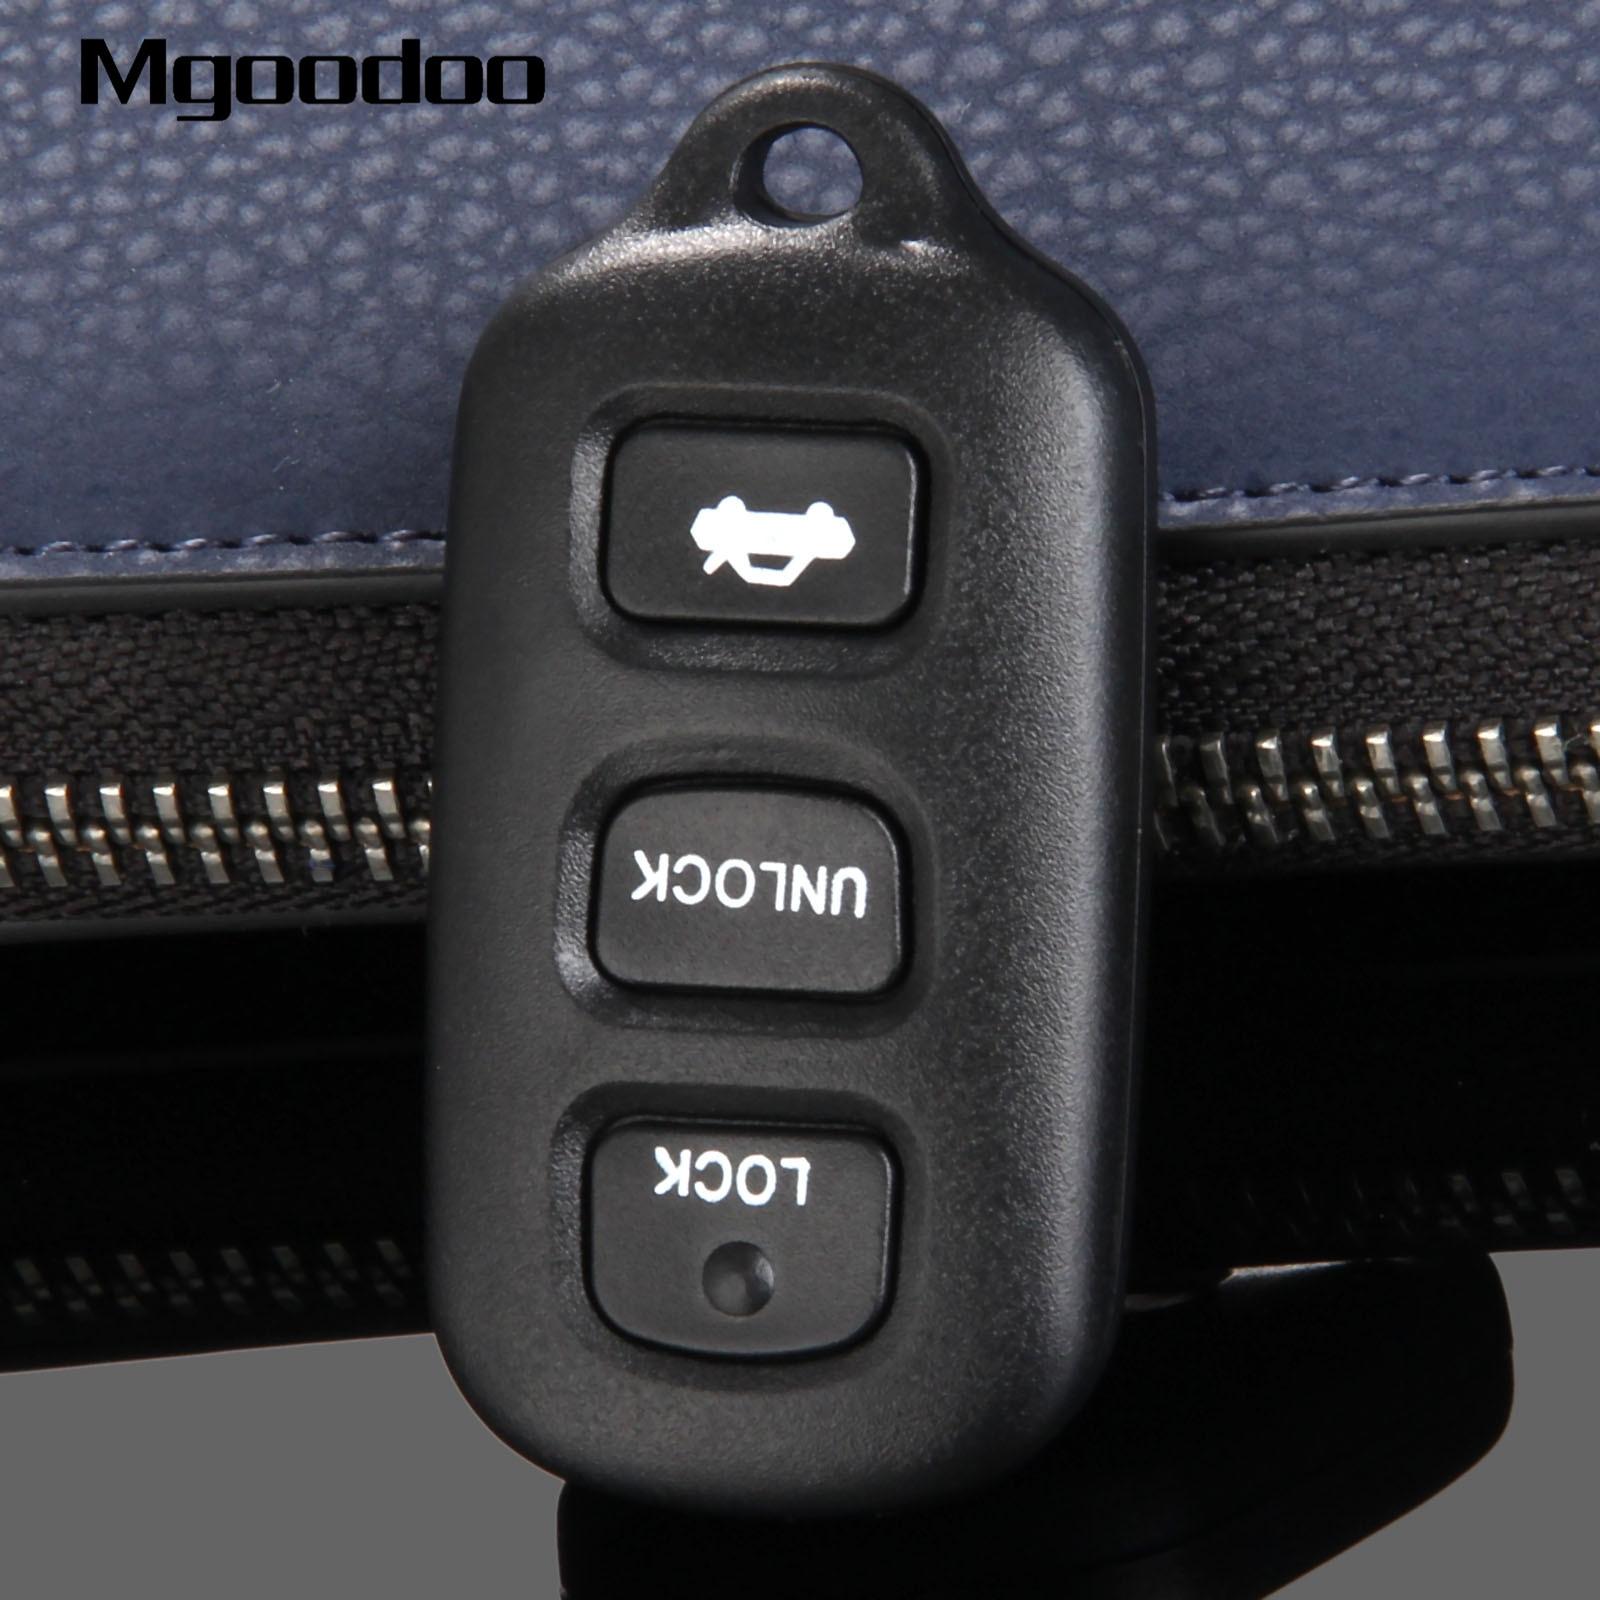 4 Buttons Car Remote Key Shell Case Key Fob Cover for Toyota Avalon Lexus SC400 ES300 LS400 SC300